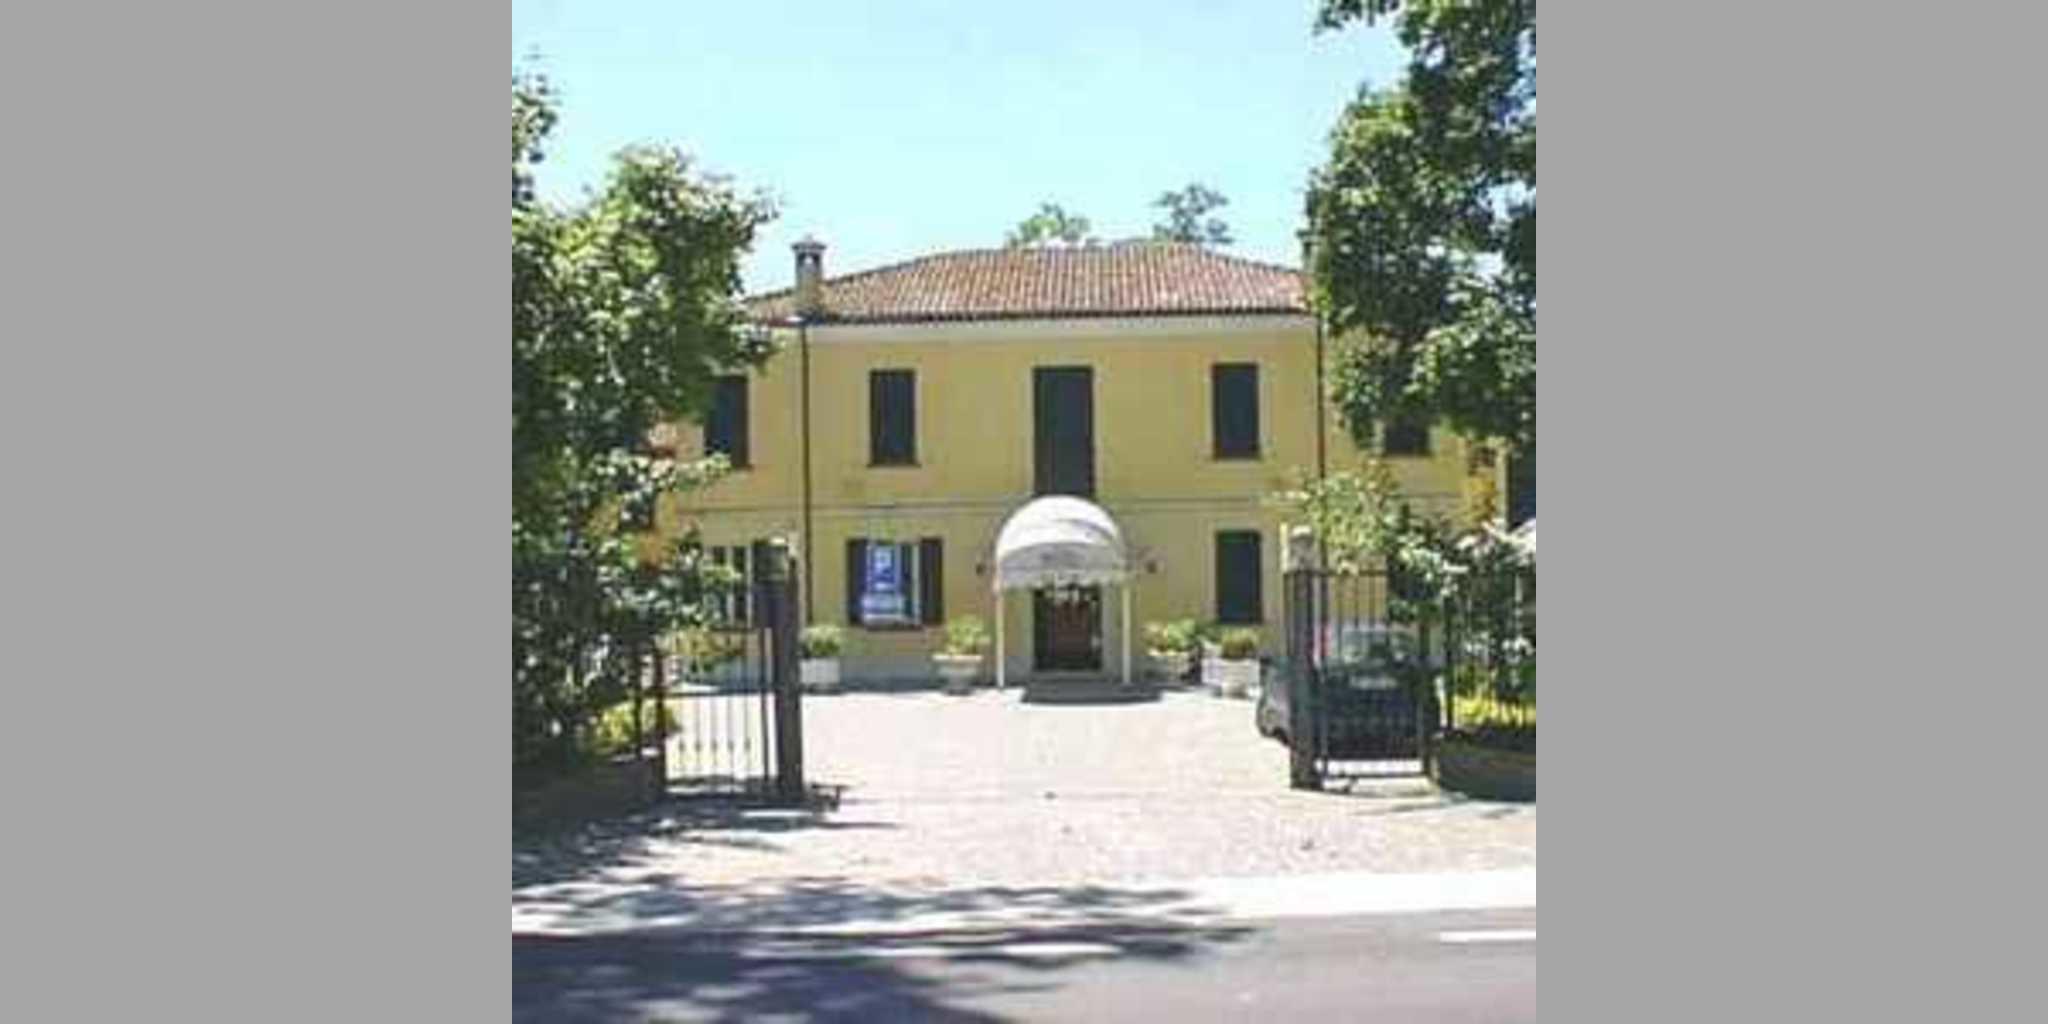 Hotel Ferrara - Cocomaro